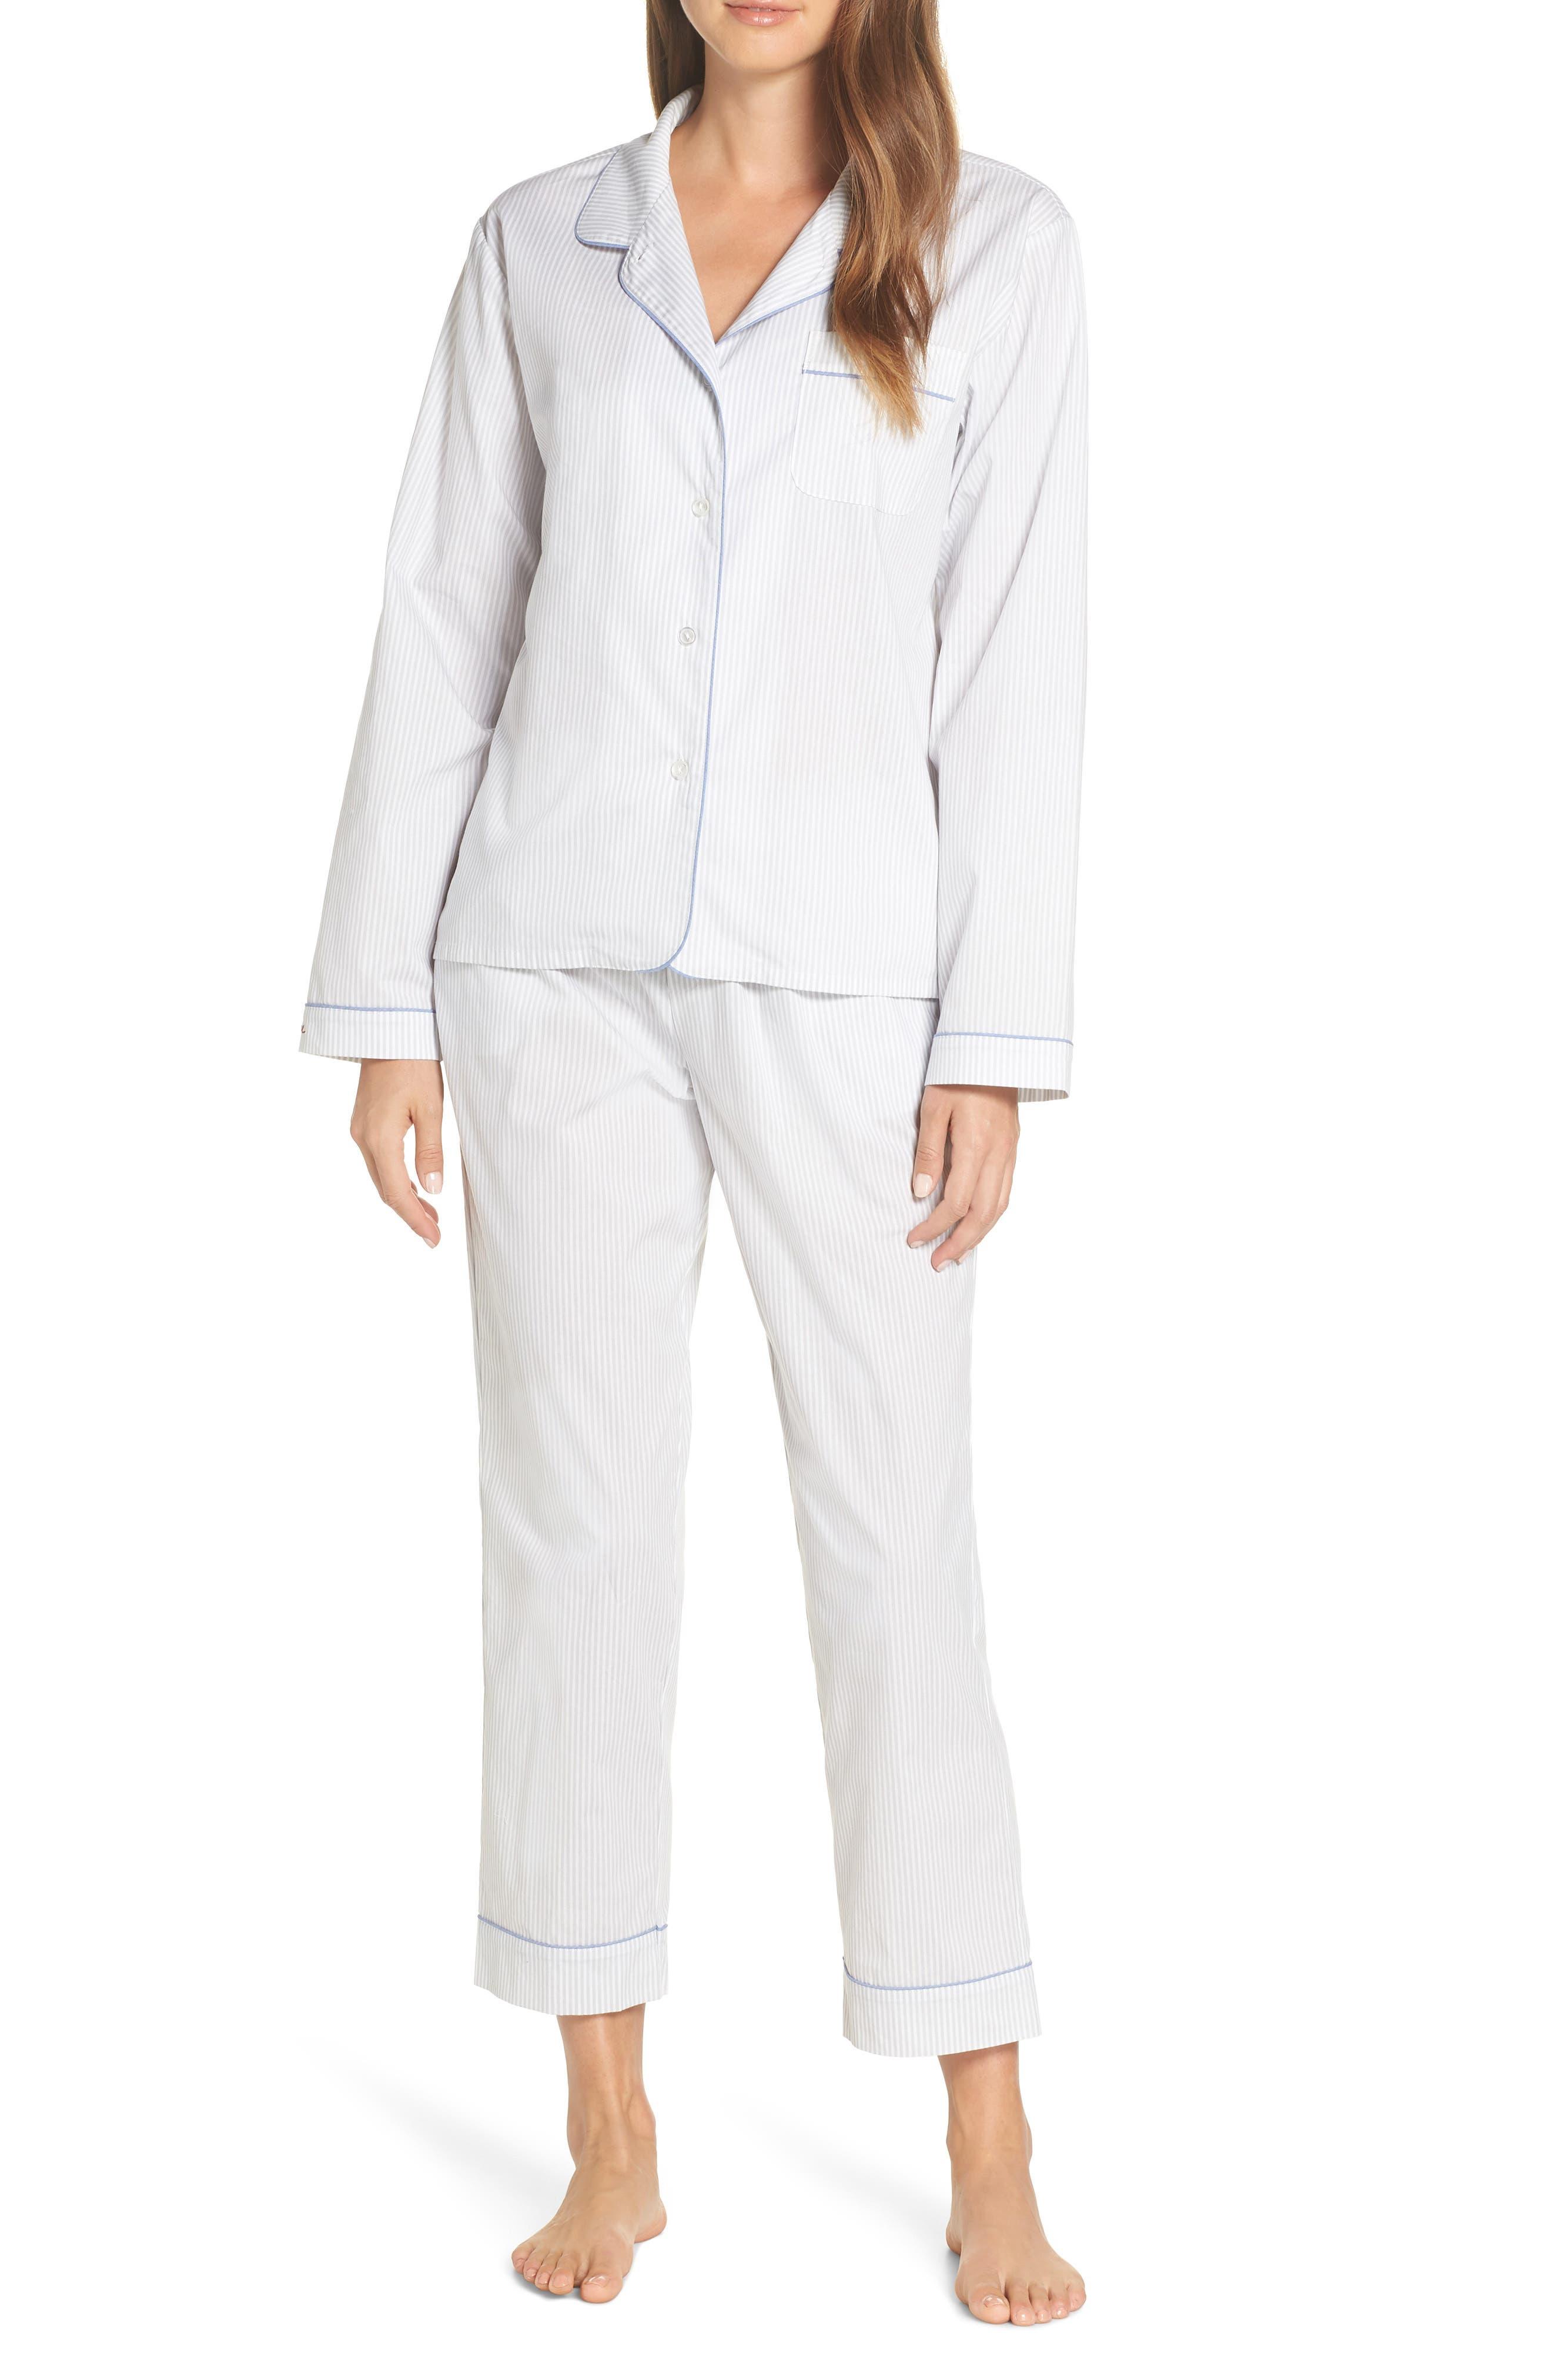 ED ELLEN DEGENERES Signature Woven Pajamas, Main, color, GREY